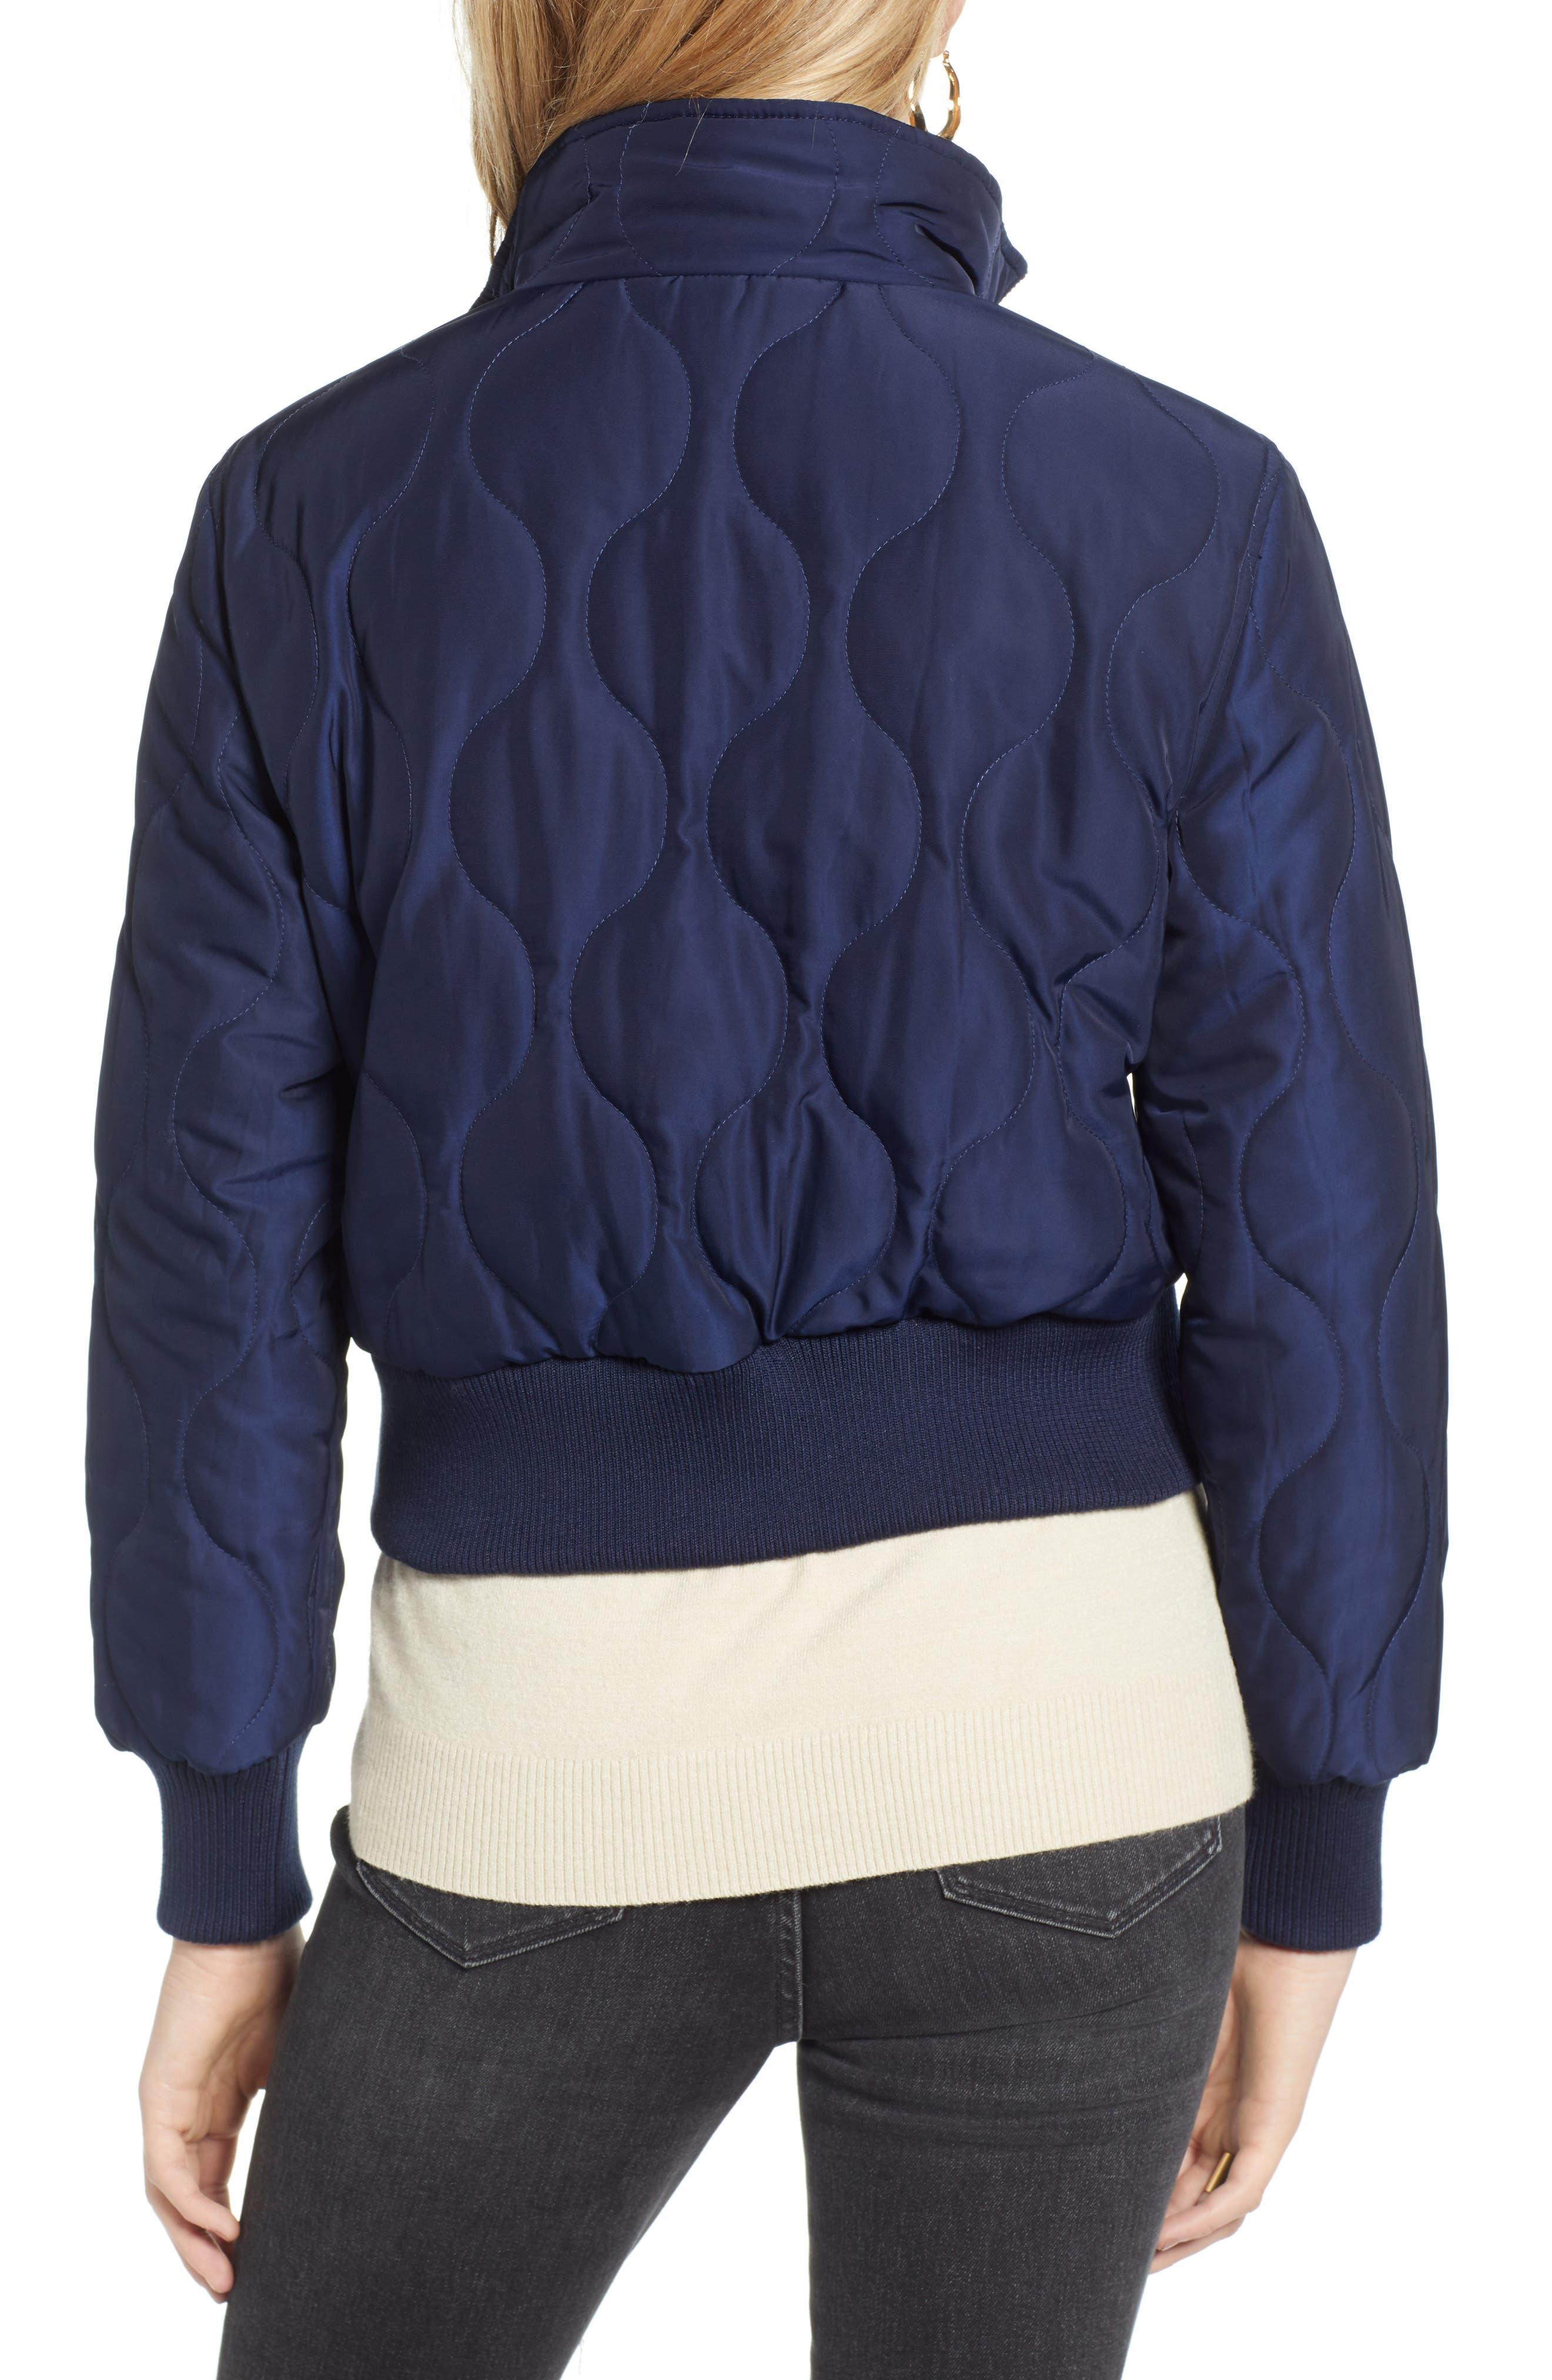 TREASURE & BOND, Satin Crop Puffer Jacket, Alternate thumbnail 2, color, NAVY MARITIME